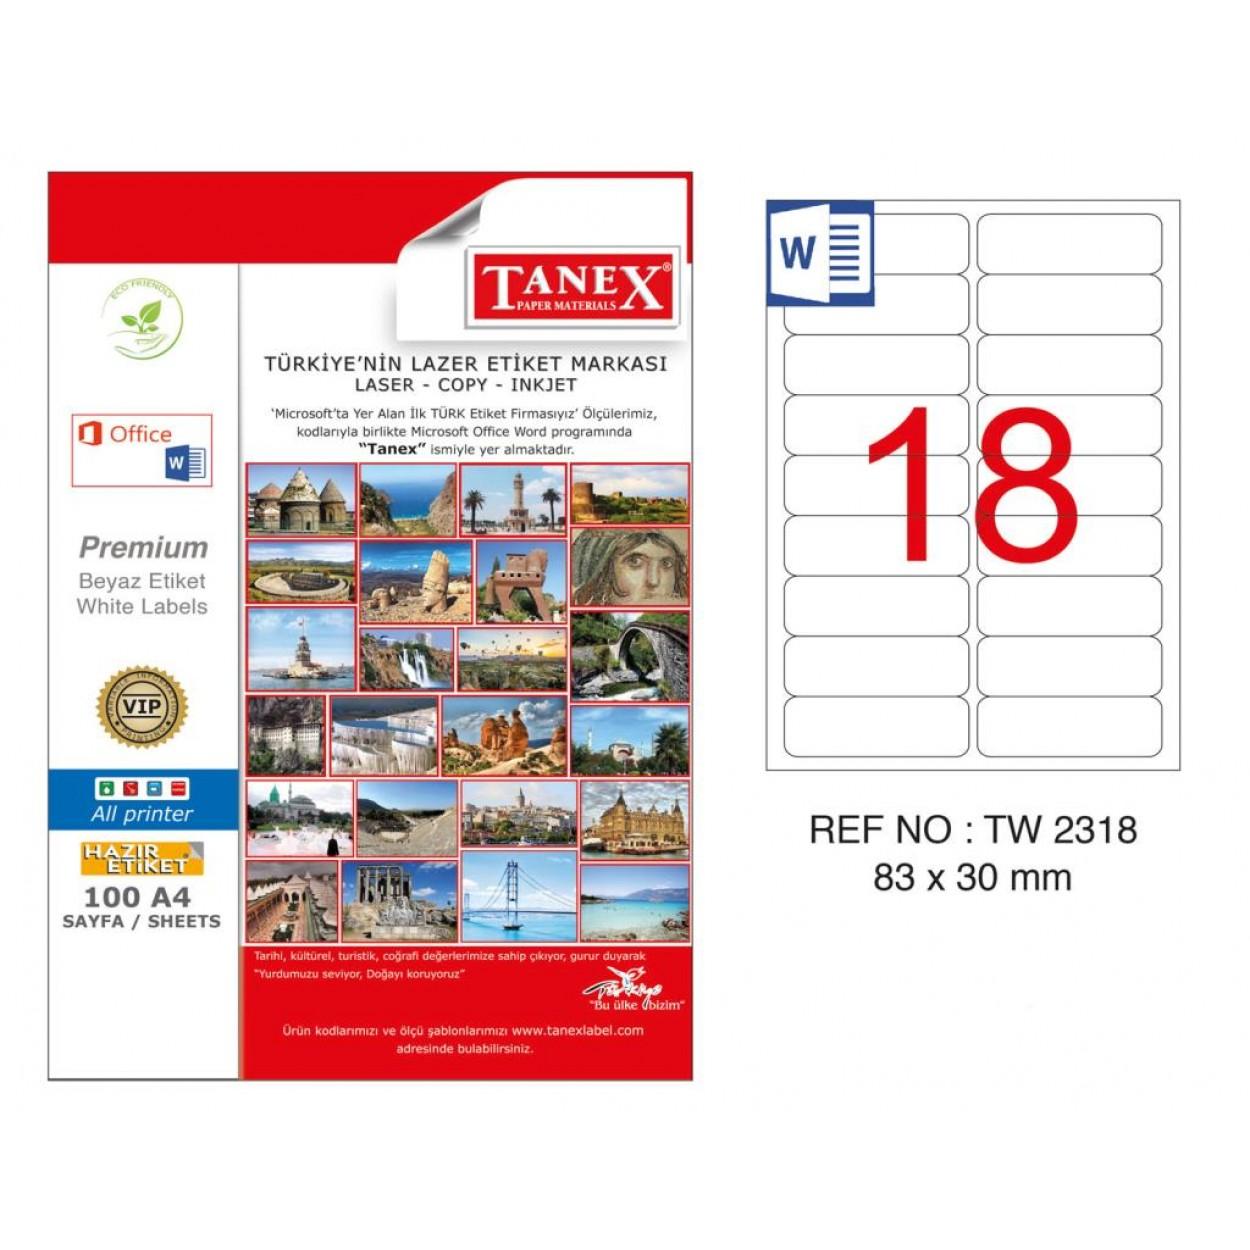 Tanex TW-2318 83x30mm Kuşe Lazer Etiket 100 Lü Paket